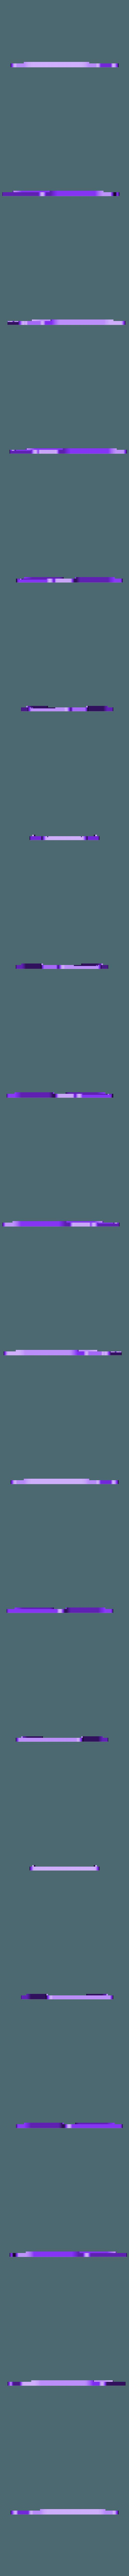 ArduPi Case Front v1 v30.stl Download STL file Arduino RaspBerry Pi Rasbian On Site Programmer • 3D printer template, nik101968